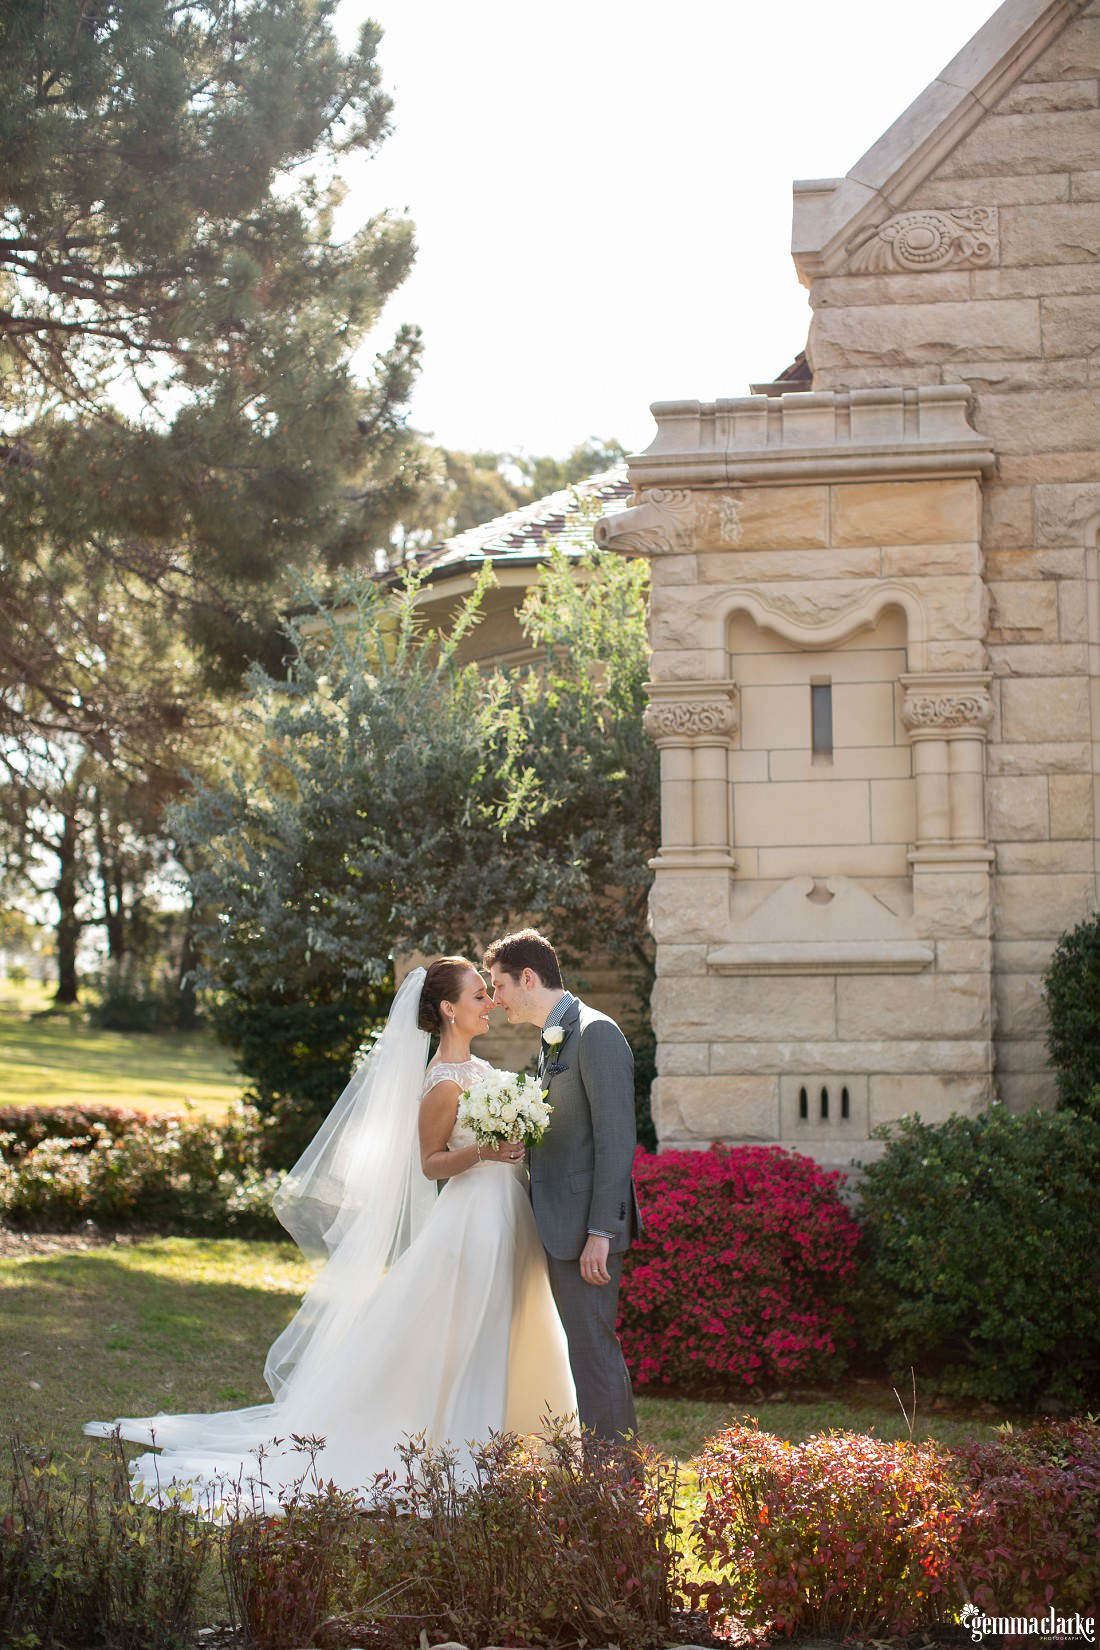 gemma-clarke-photography_kings-school-wedding_balmoral-beach-reception_bathers-pavilion-wedding_luisa-and-nick_0043